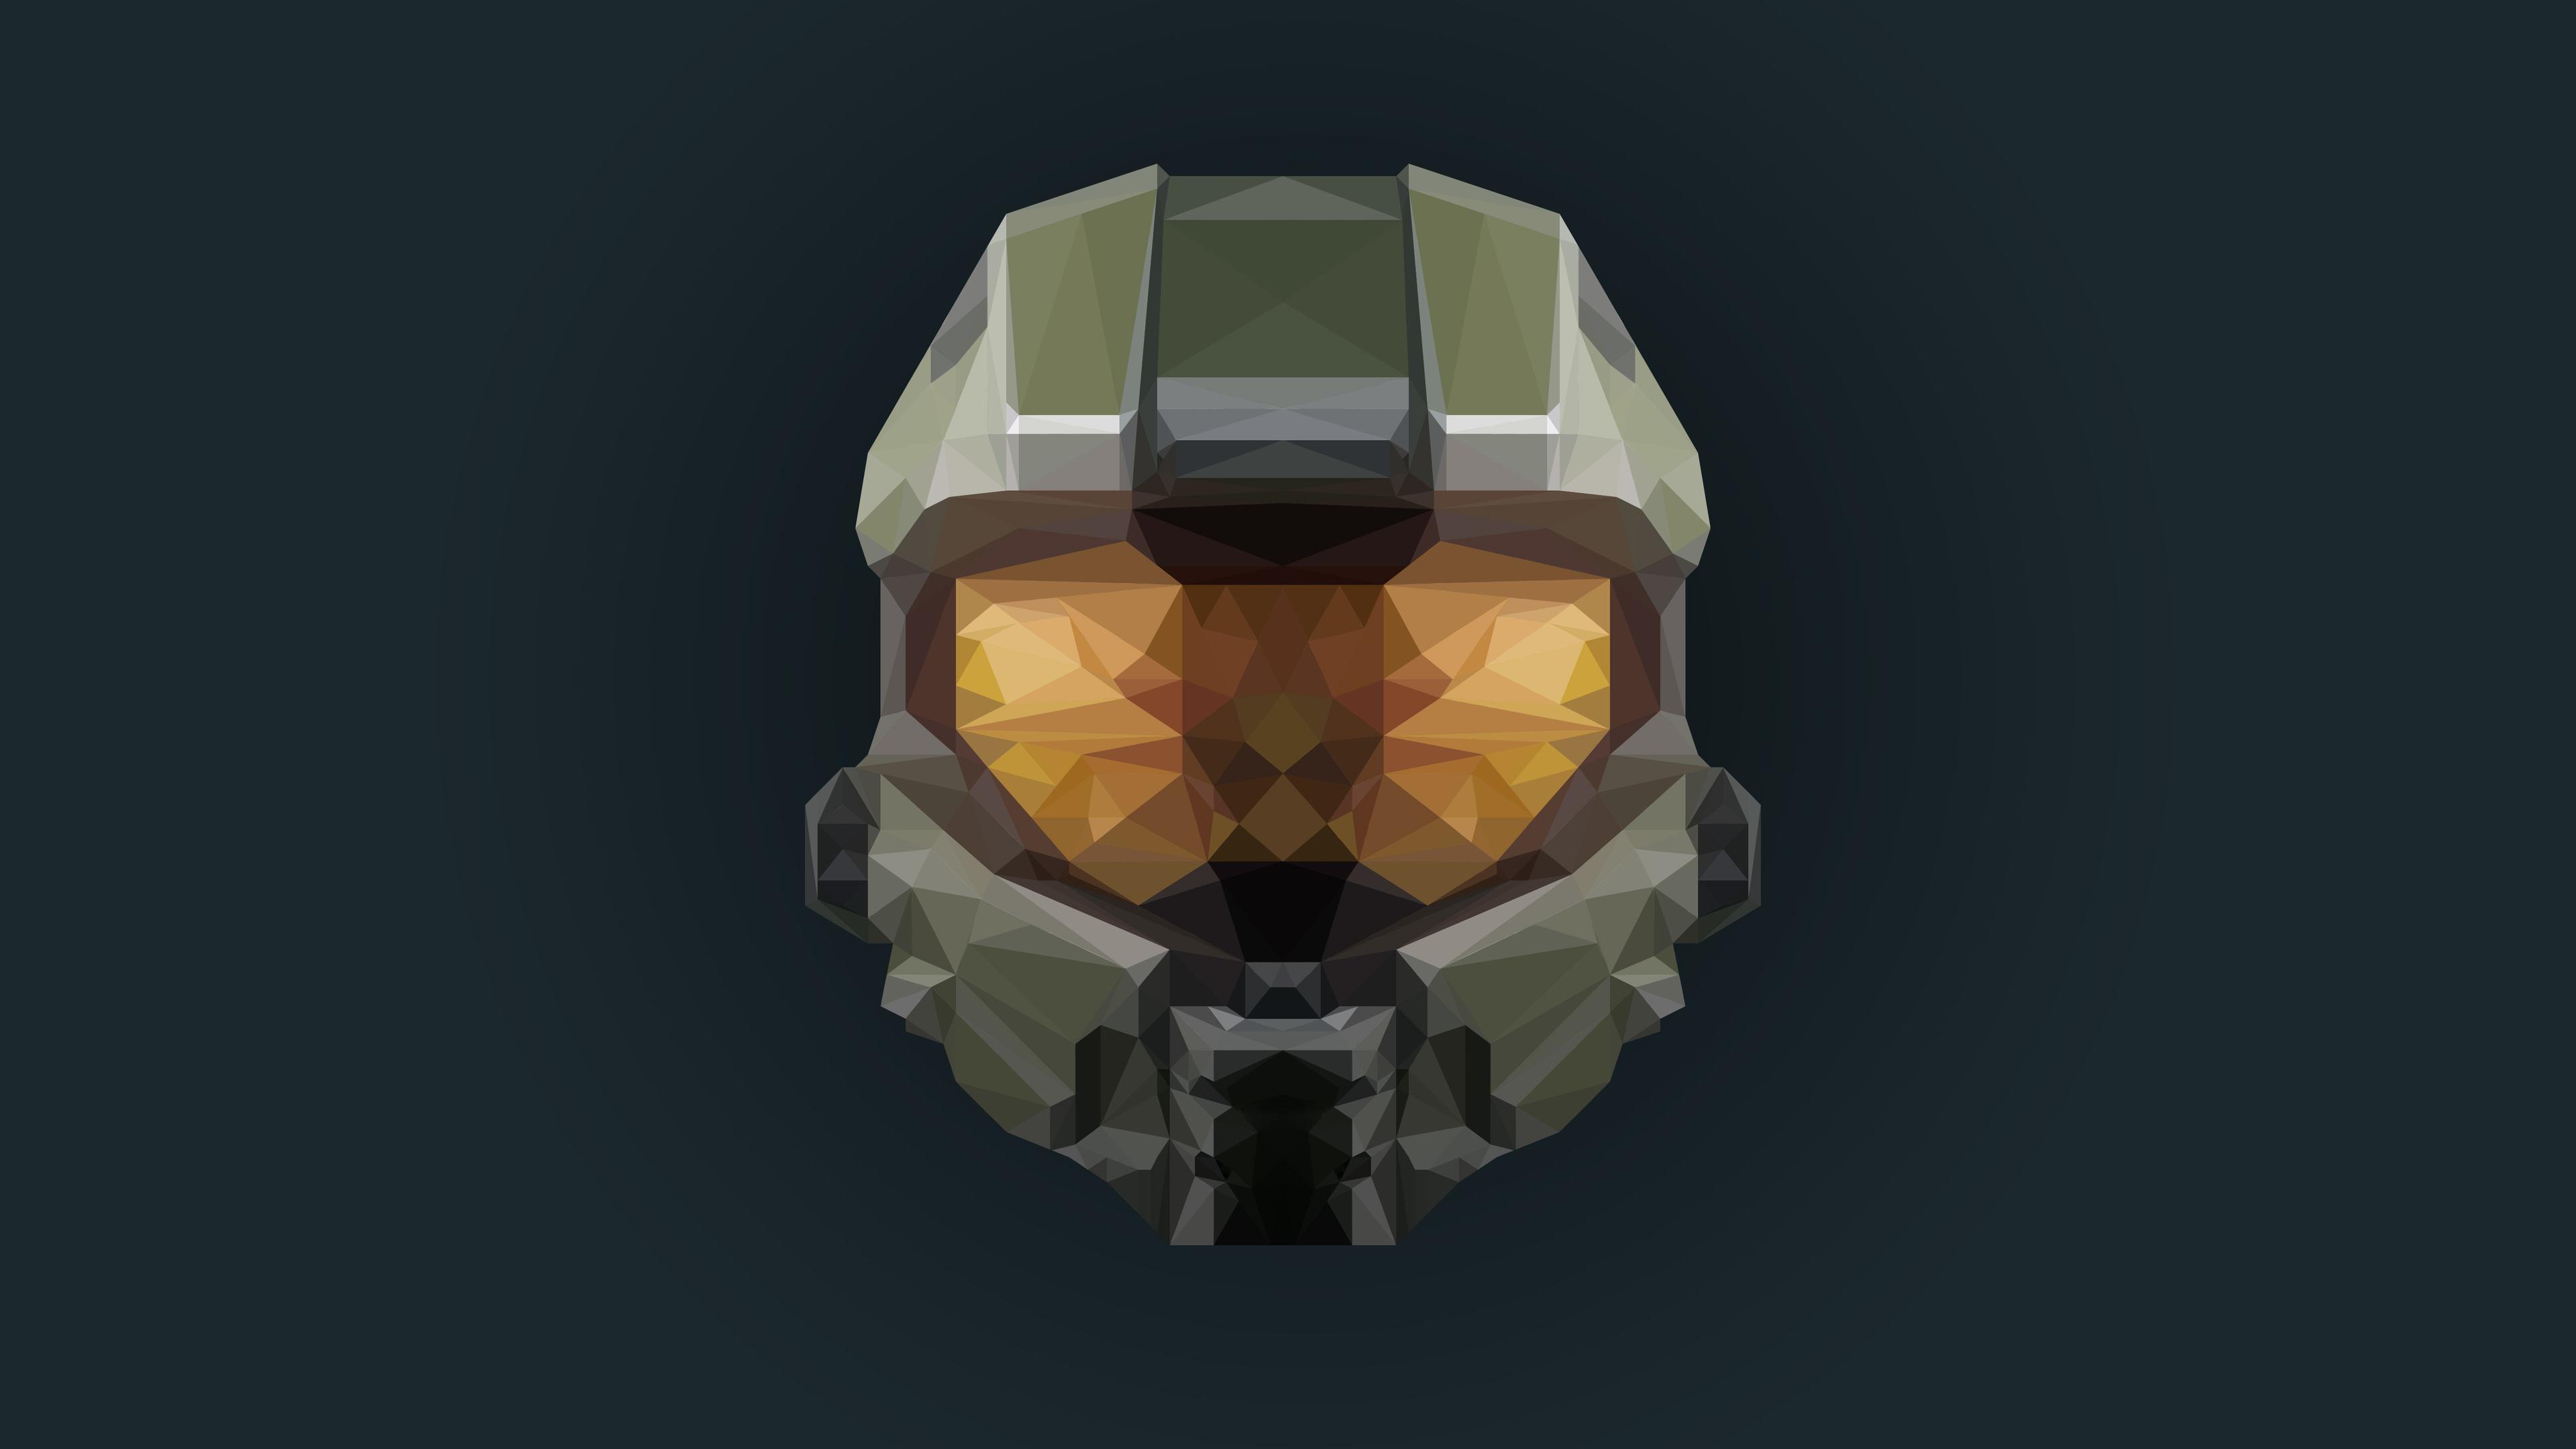 Wallpaper 4k Halo Infinite Master Chief 5k 2018 Games